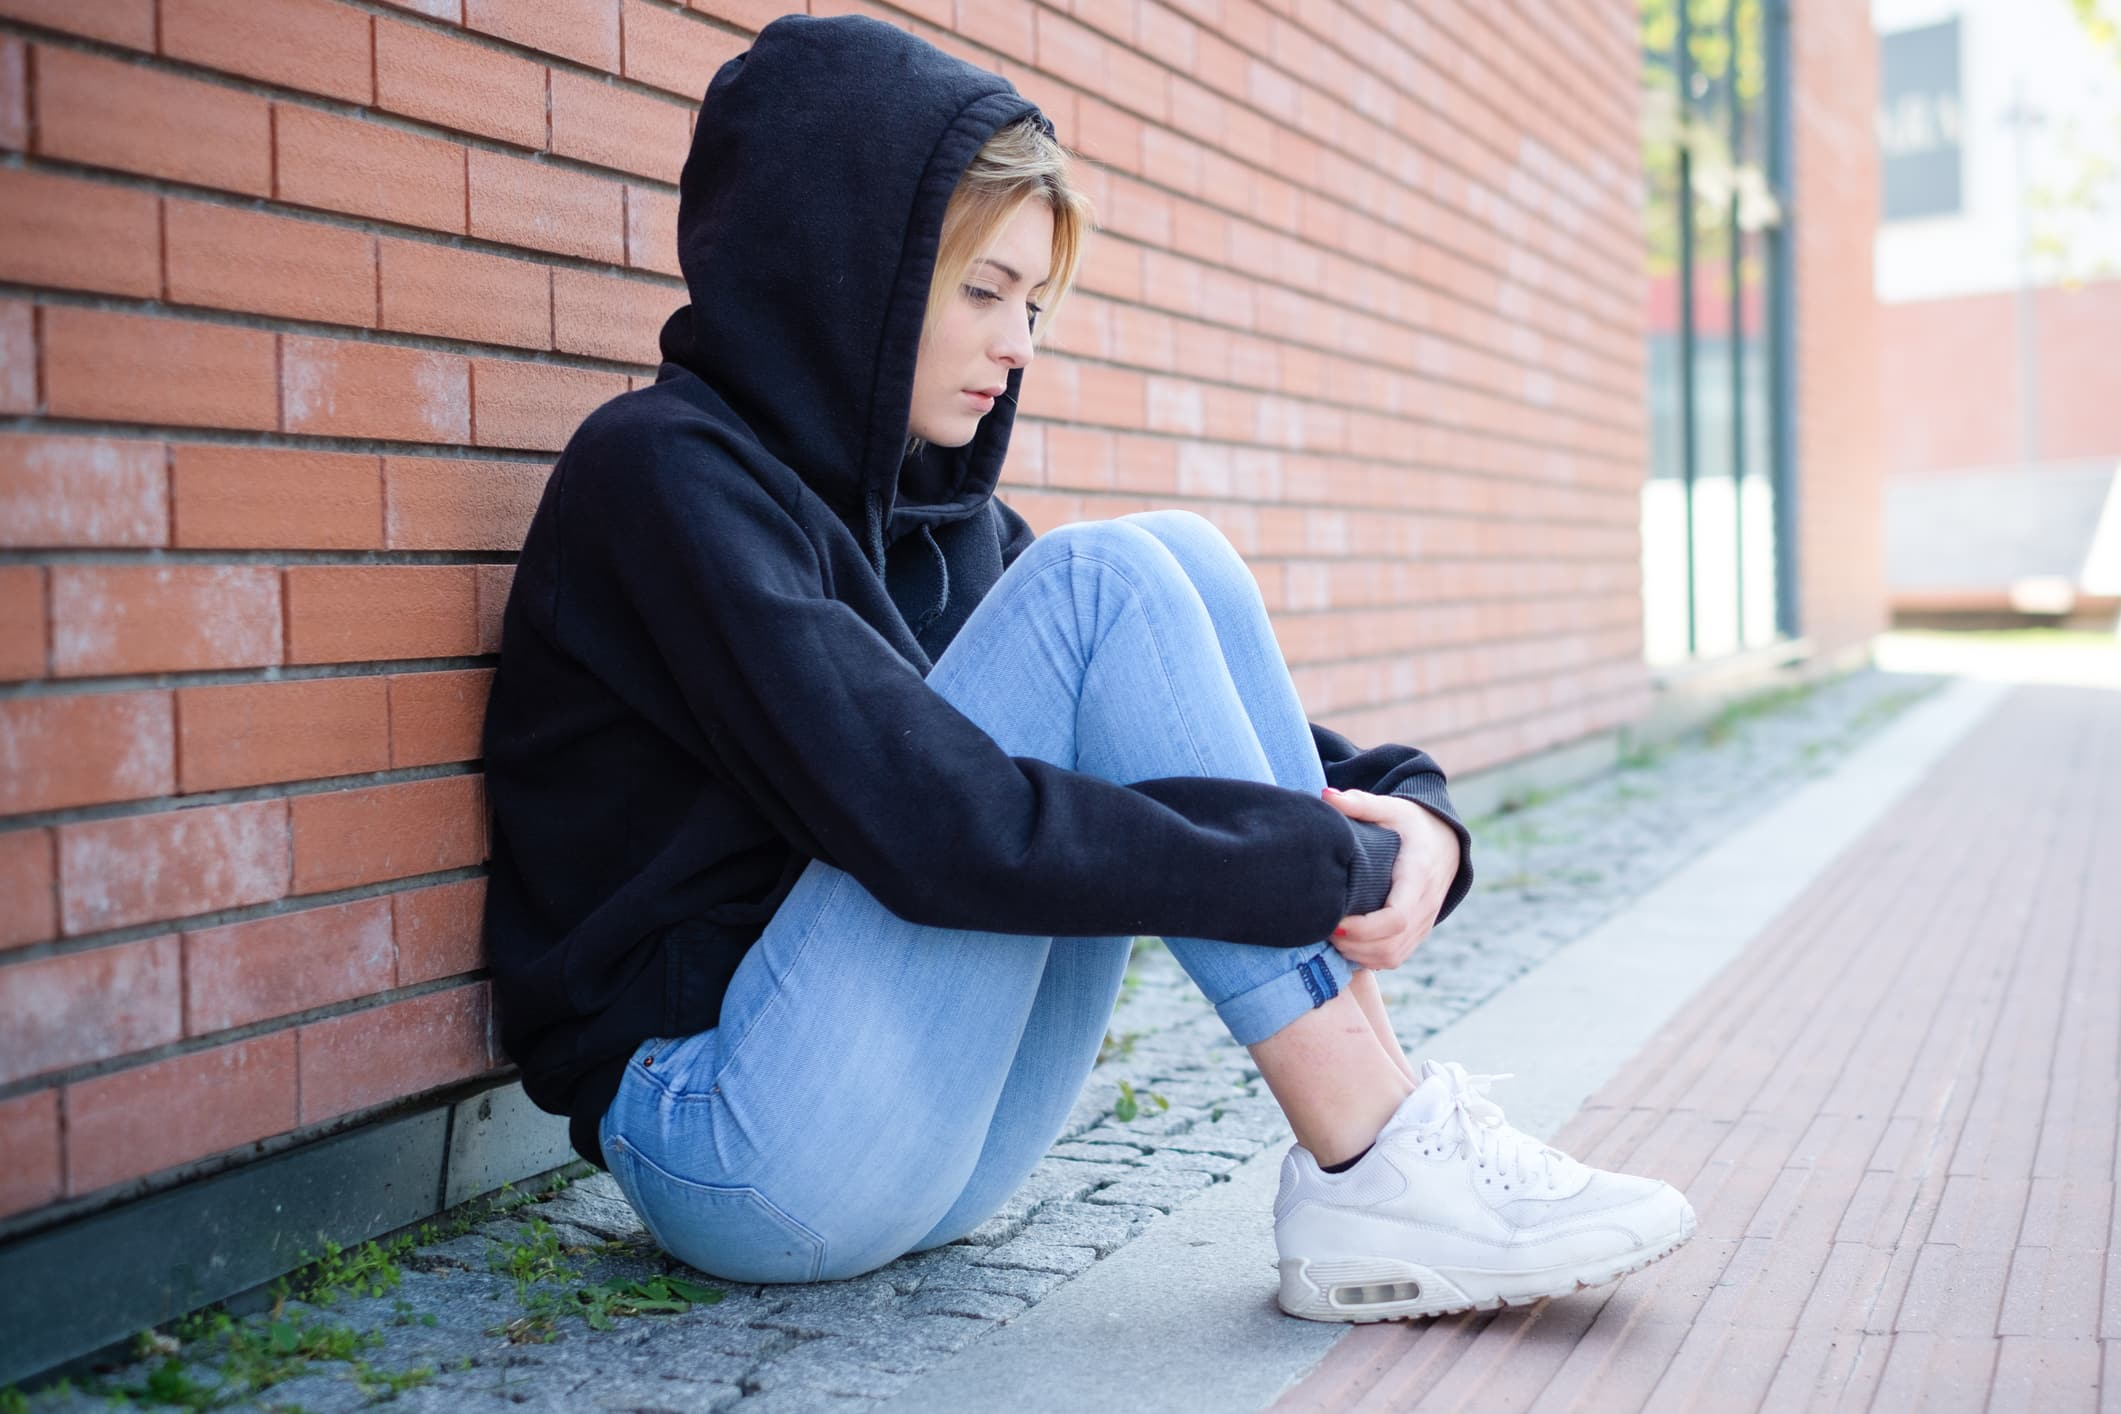 woman-who-has-a-drug-addiction